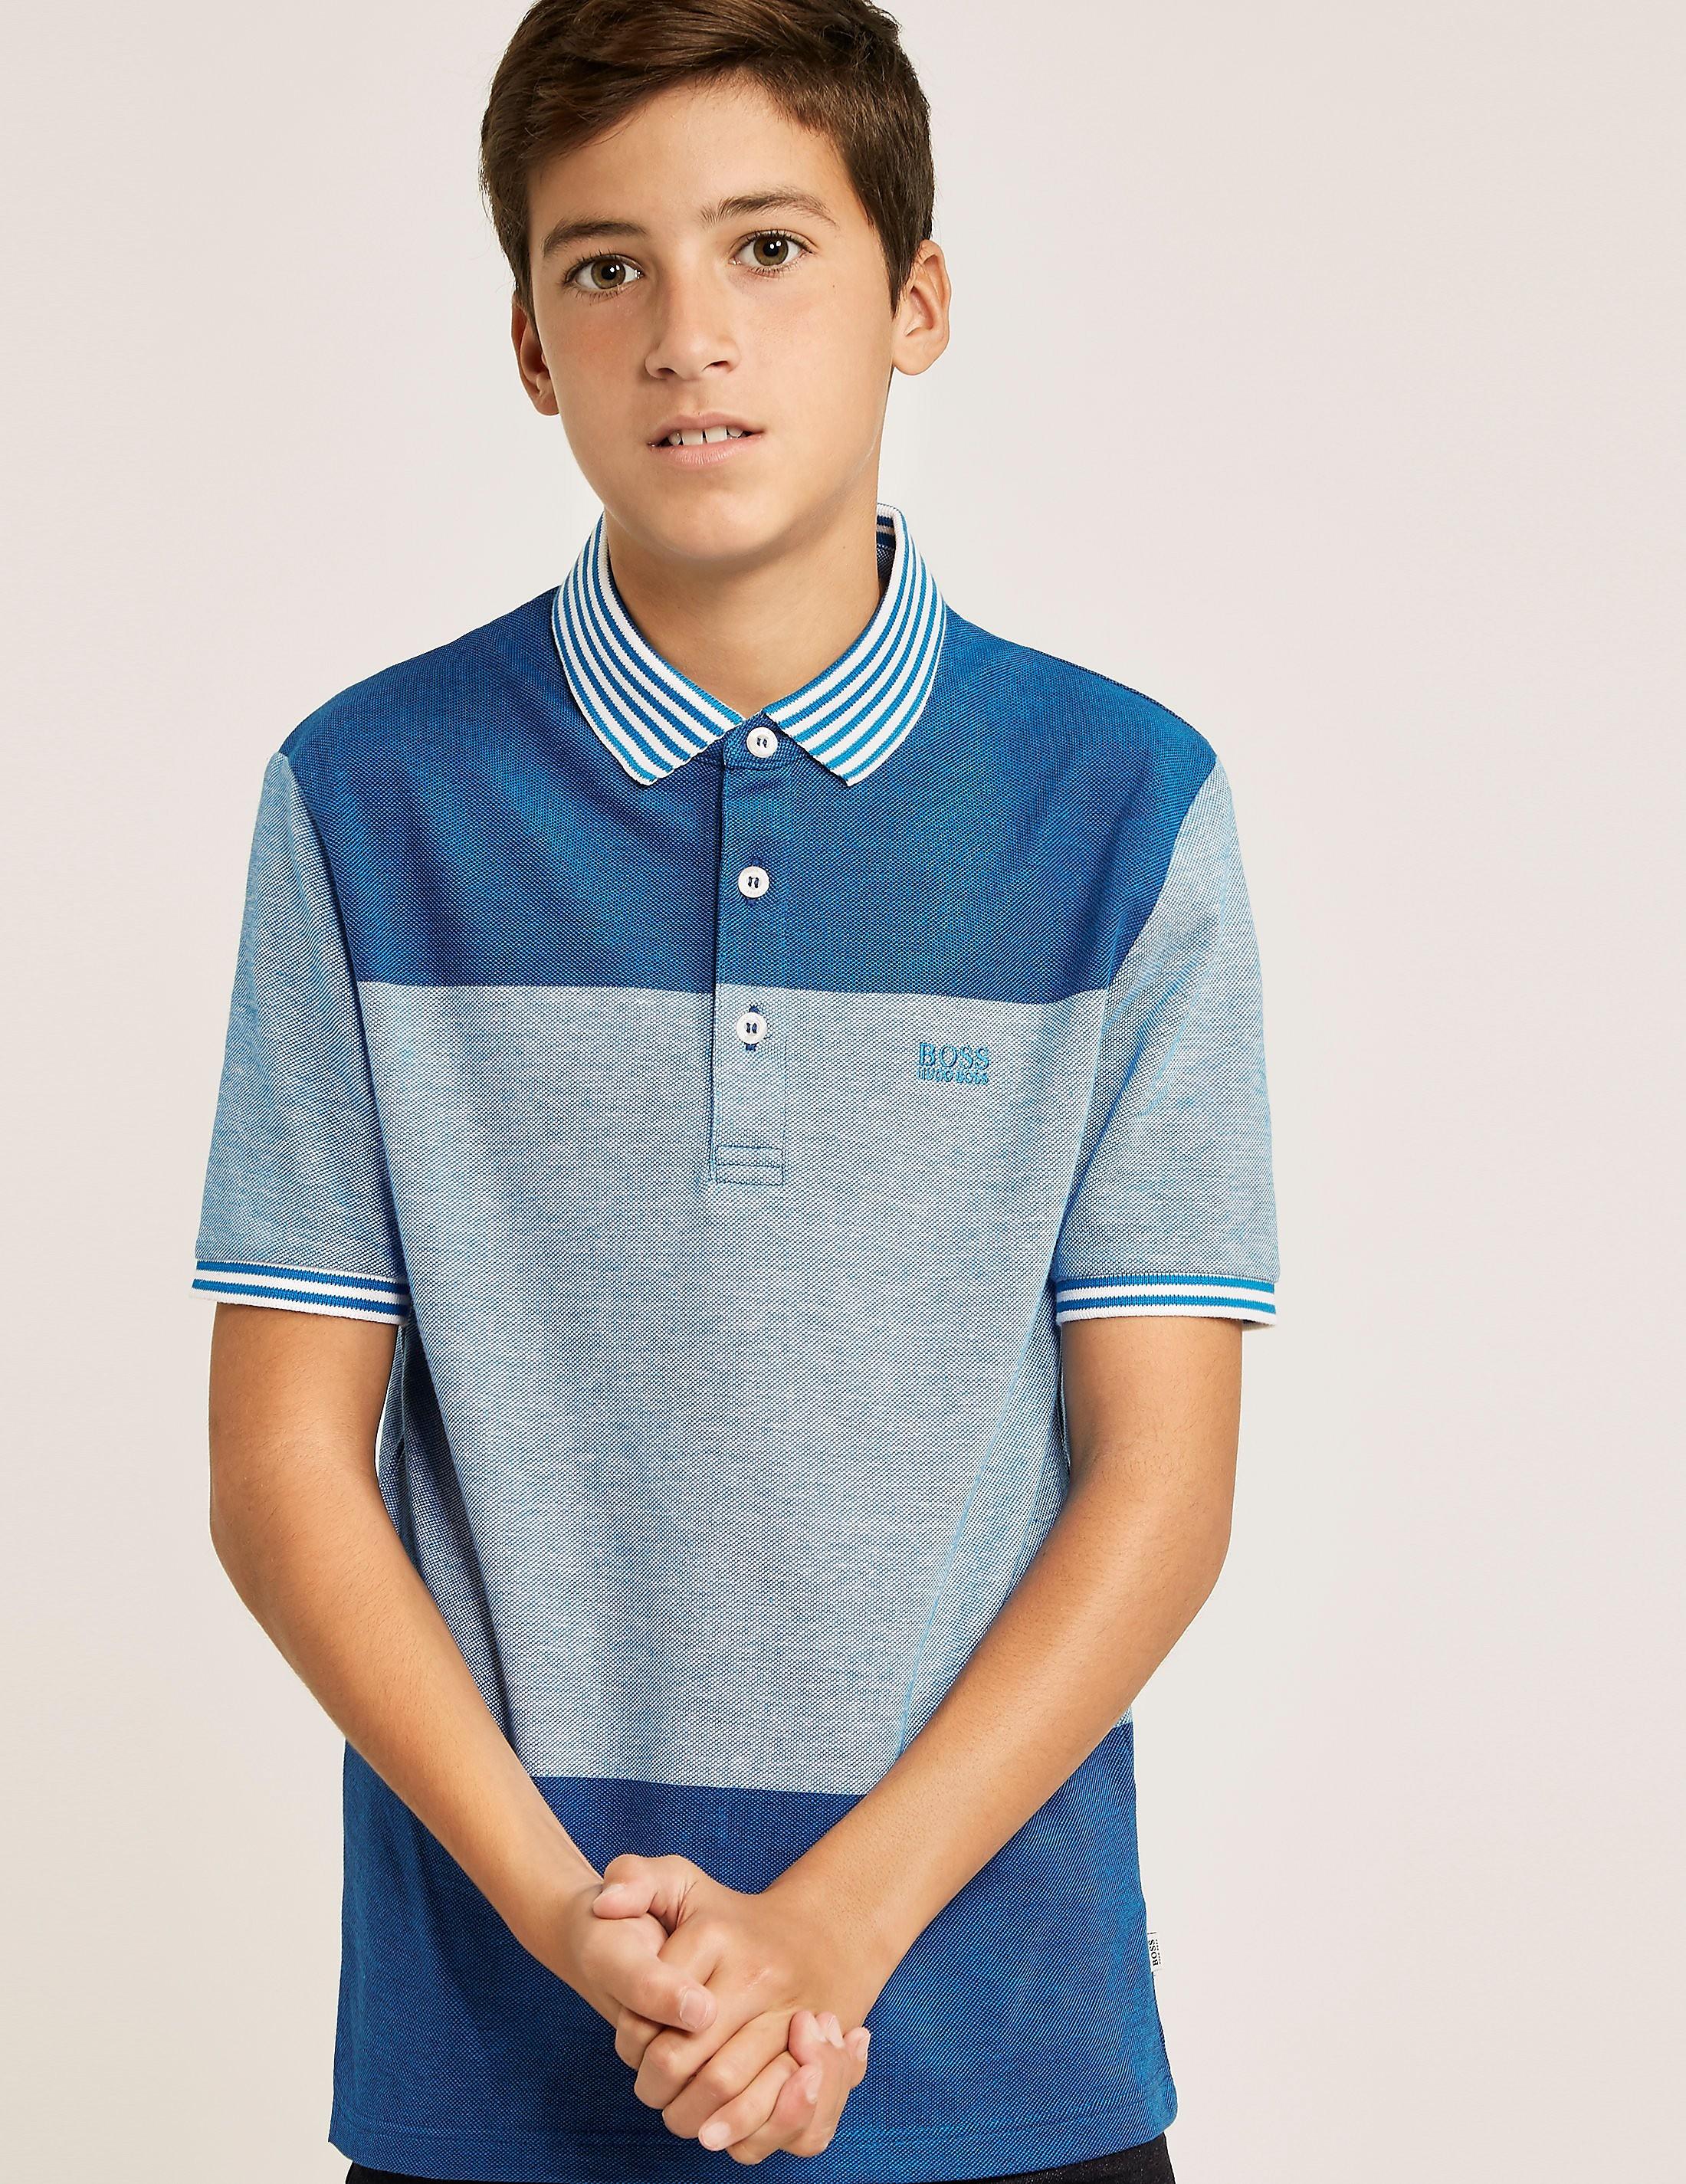 BOSS Striped Collar Polo Shirt